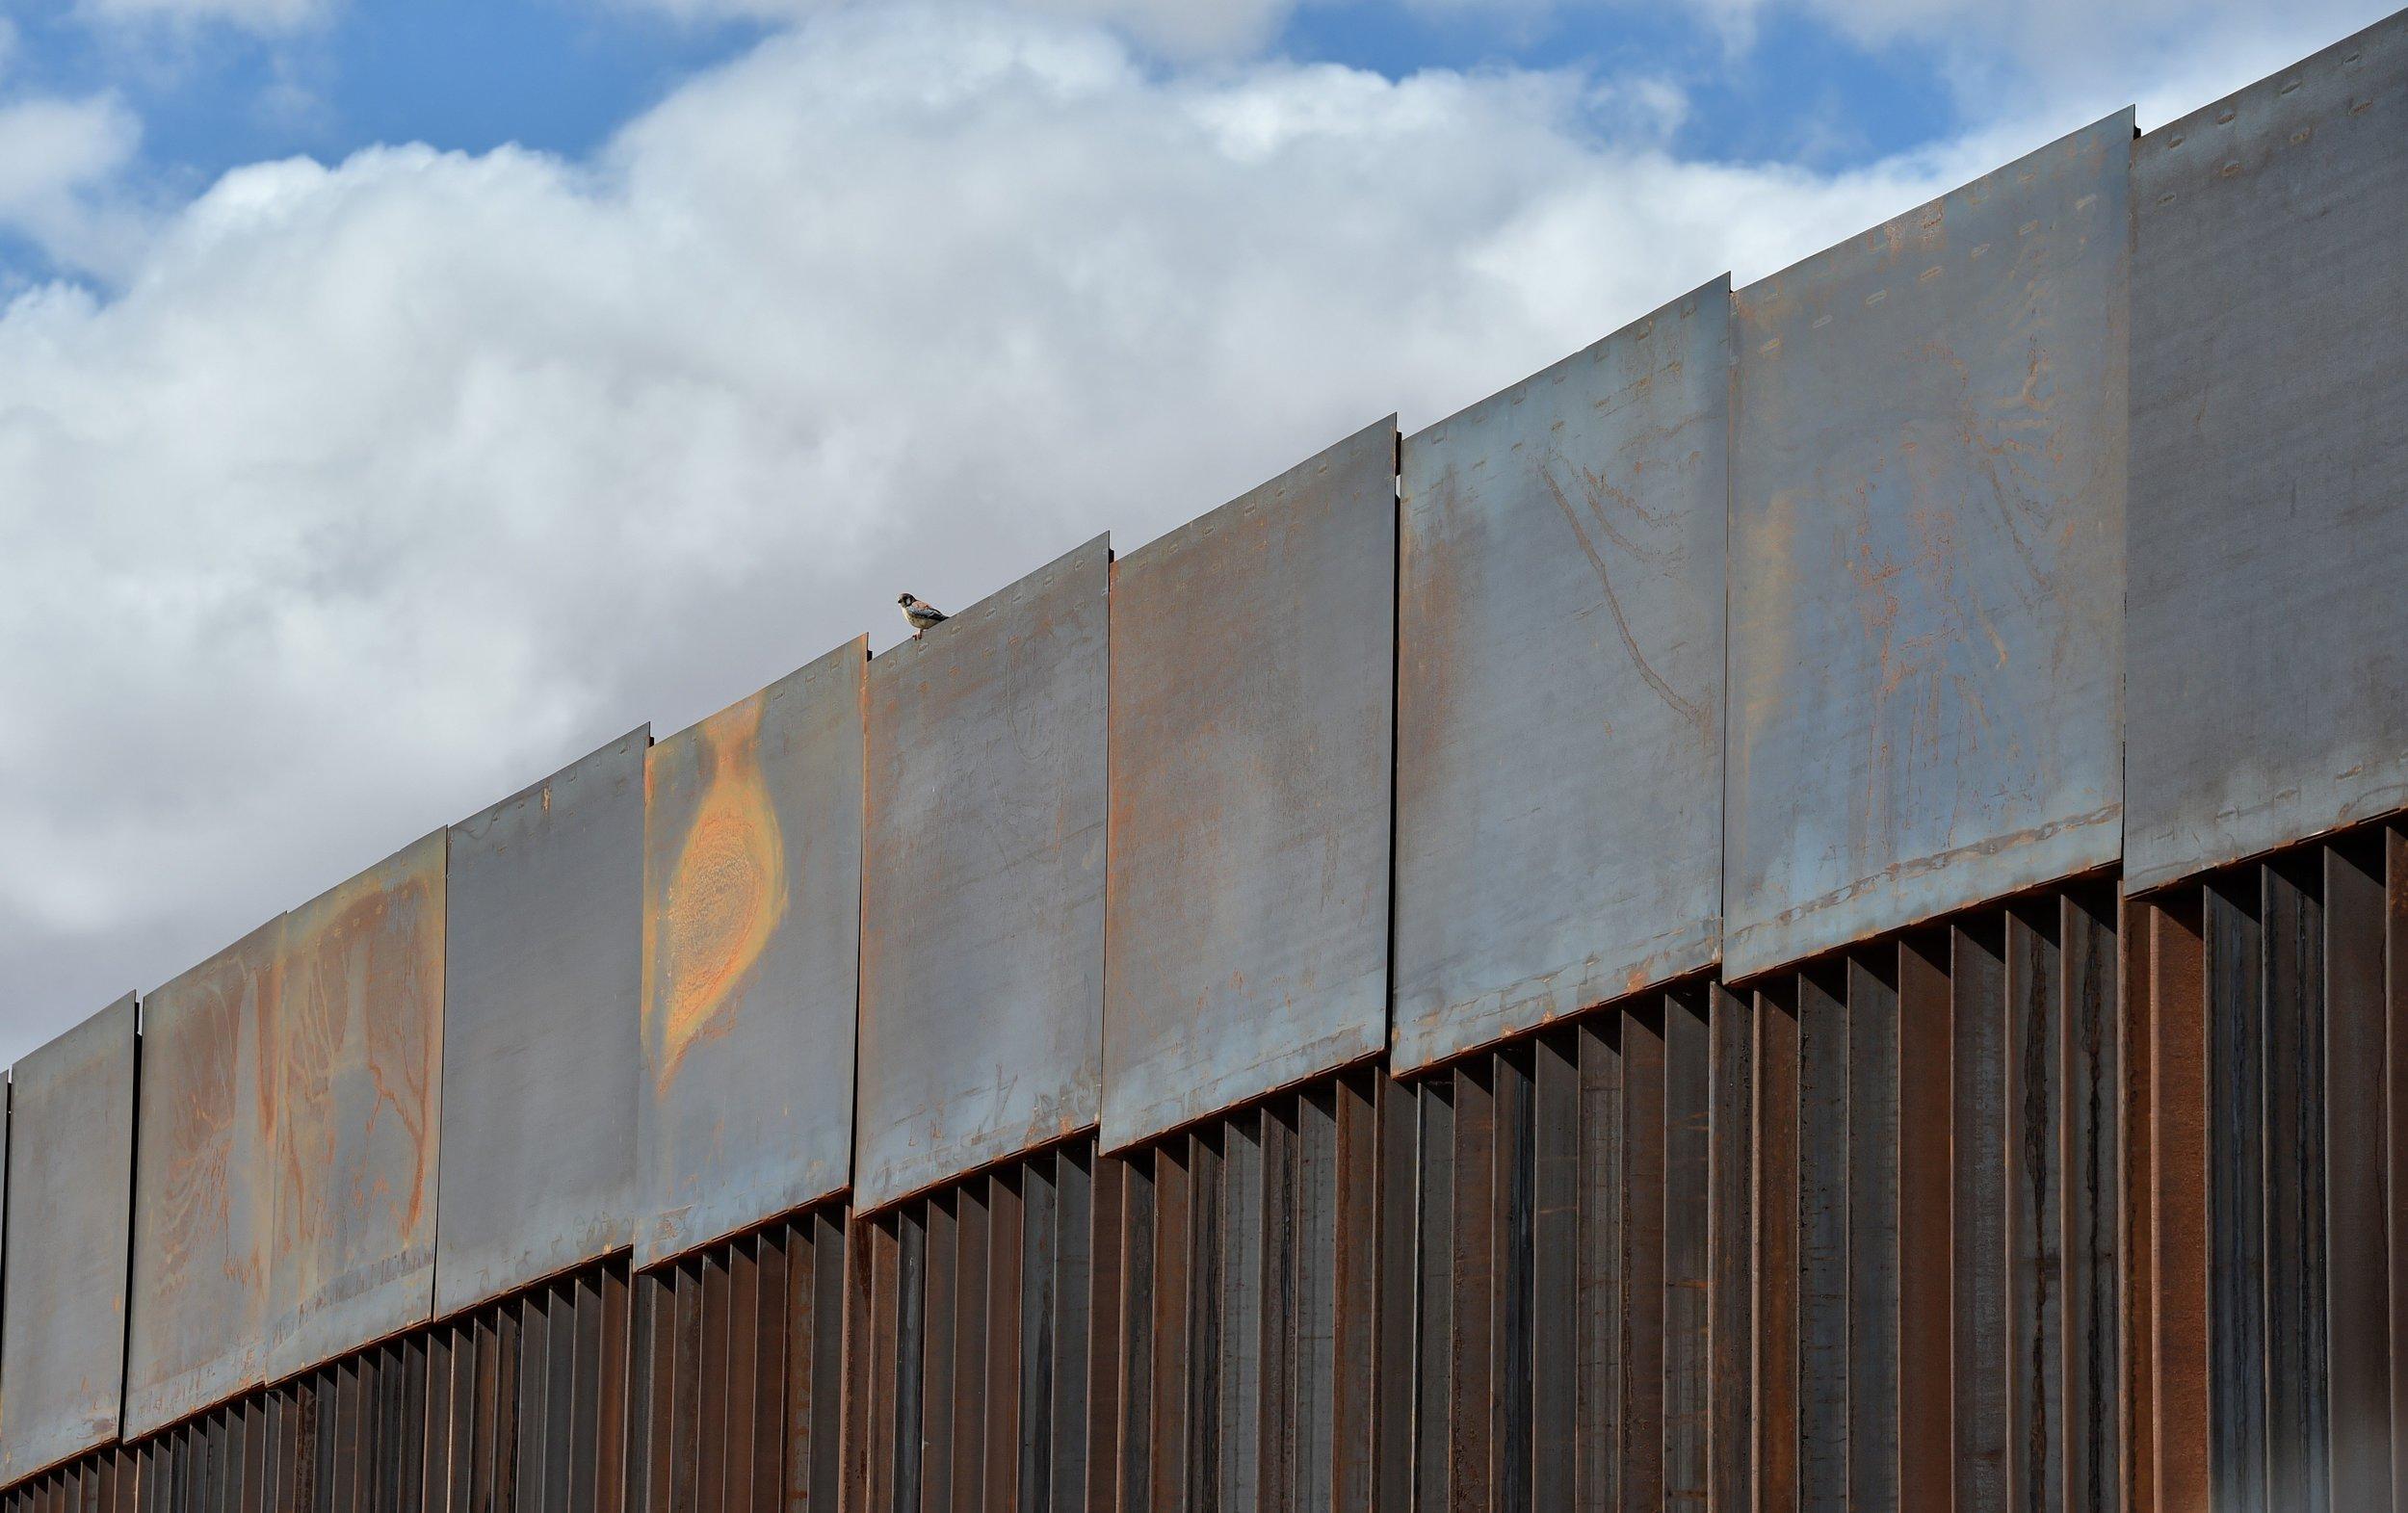 mexico_border_wall.jpg